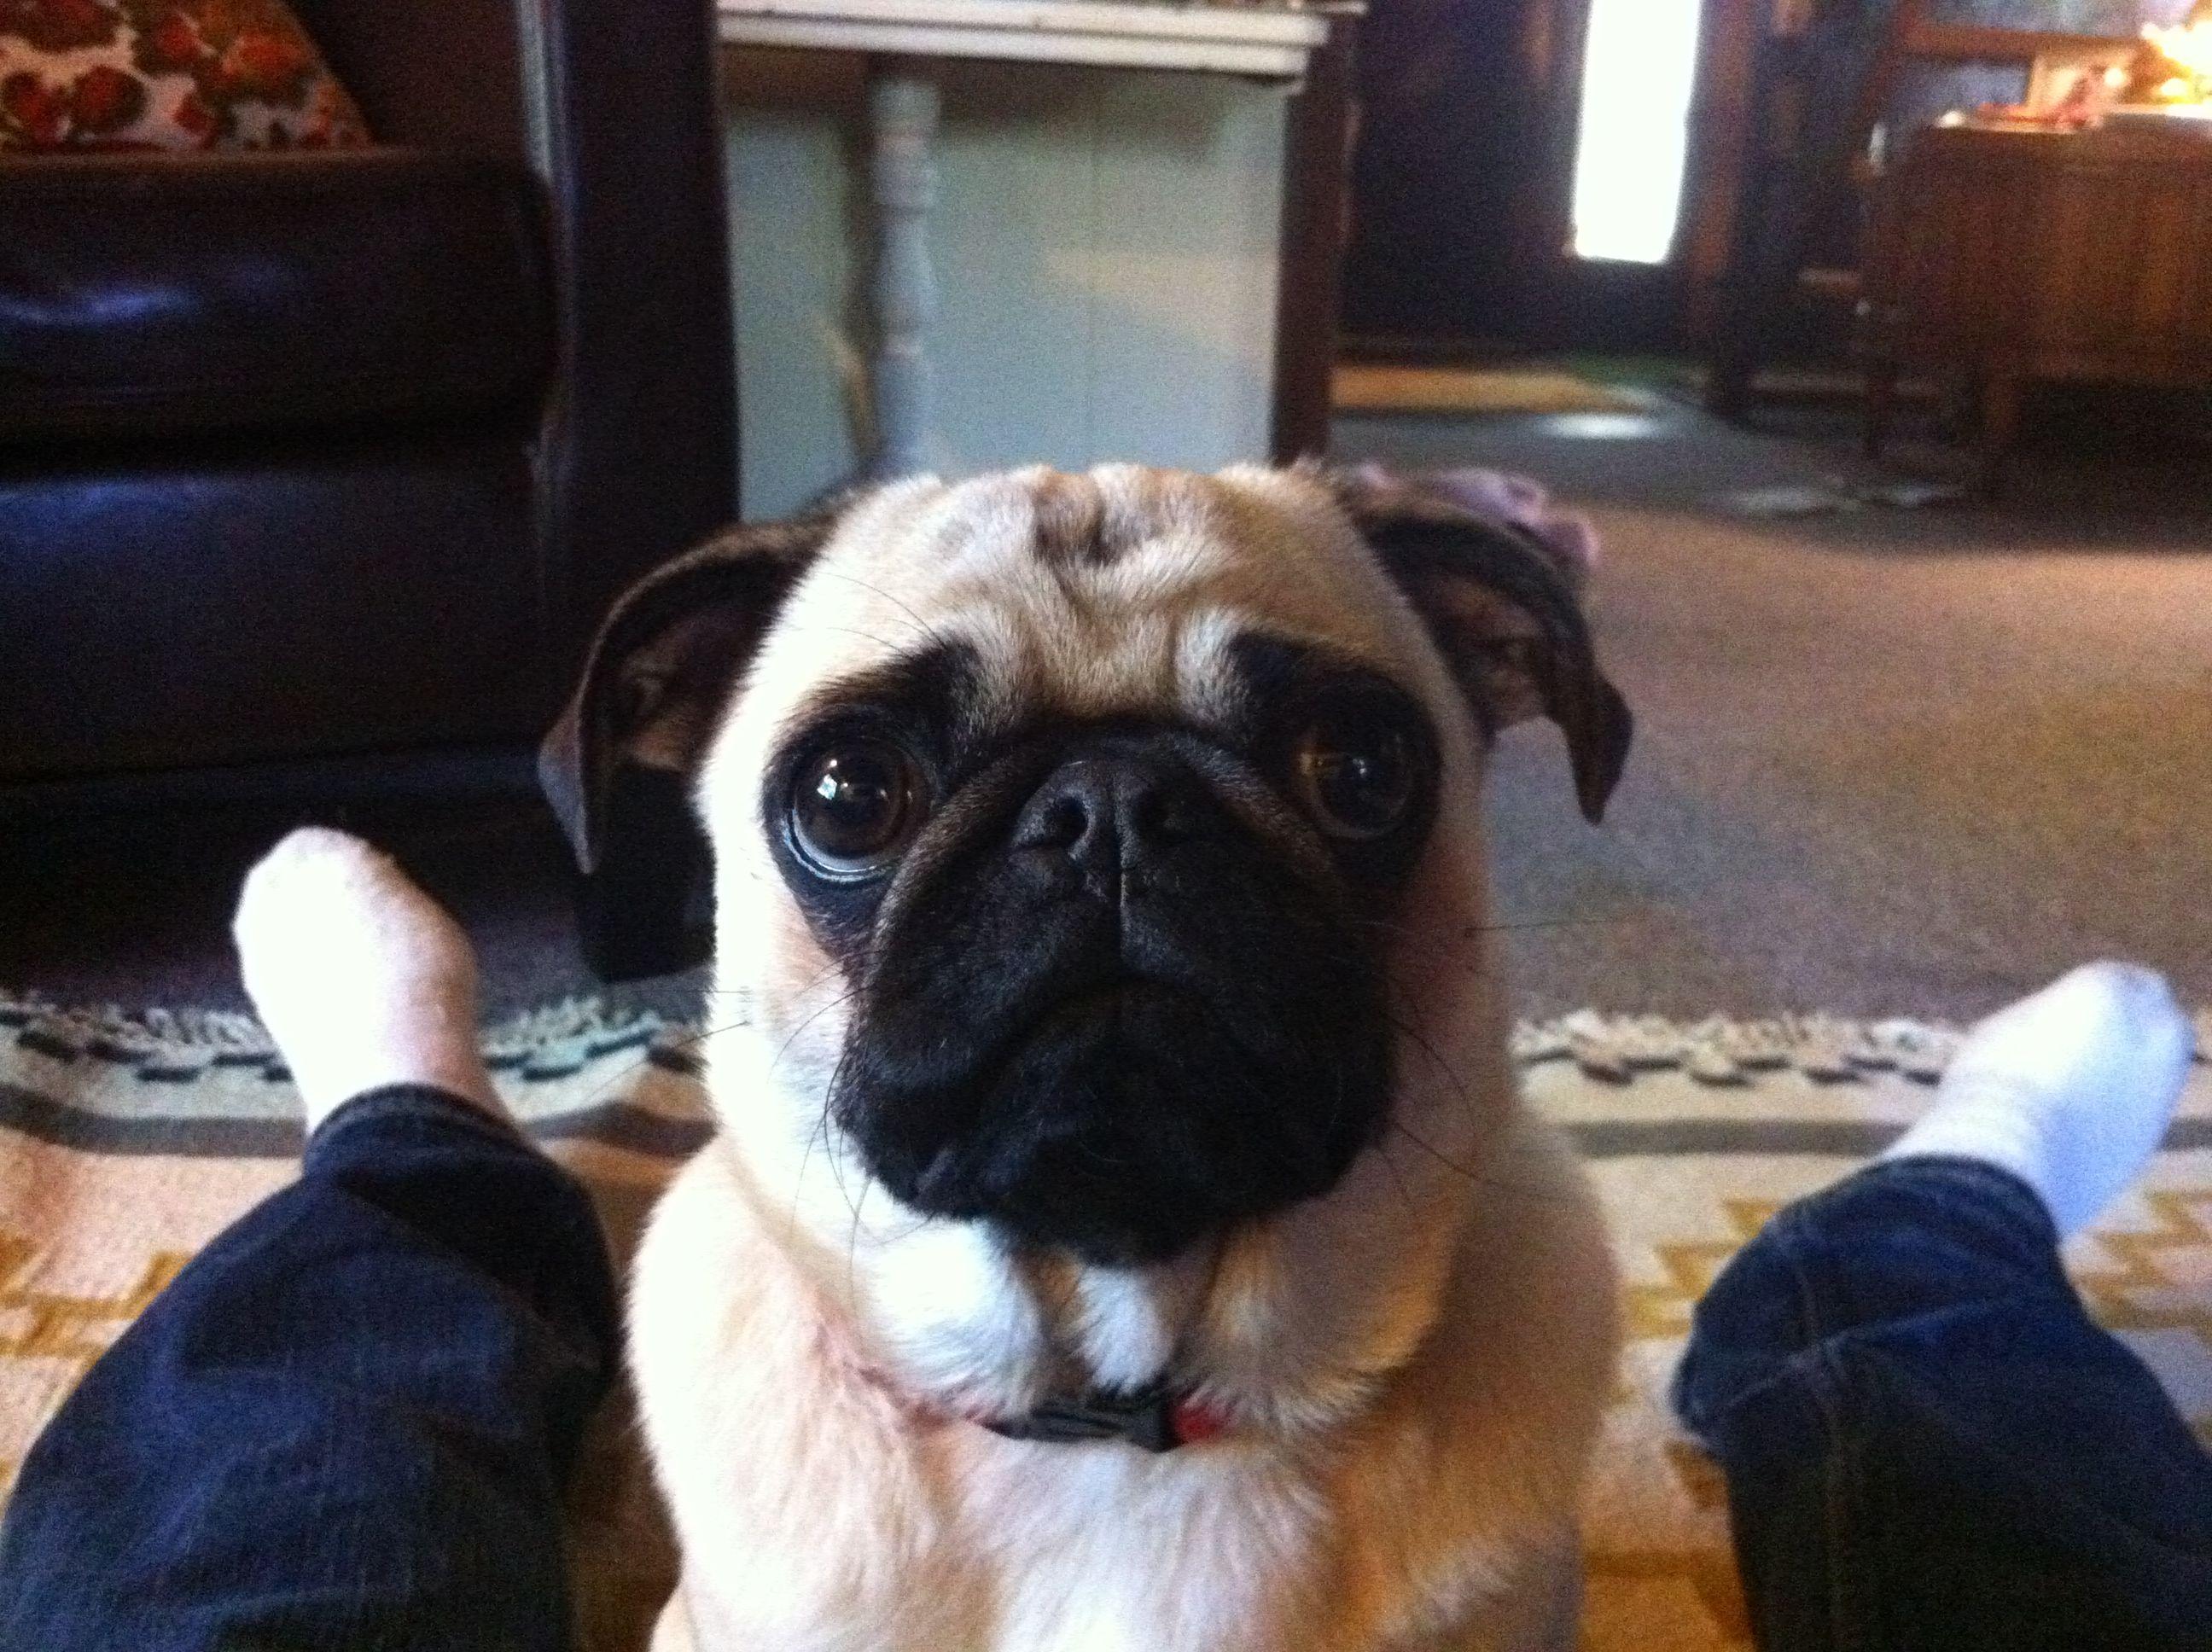 Best Looking Pug Ever Pug Pugs Cute Animals Puppies